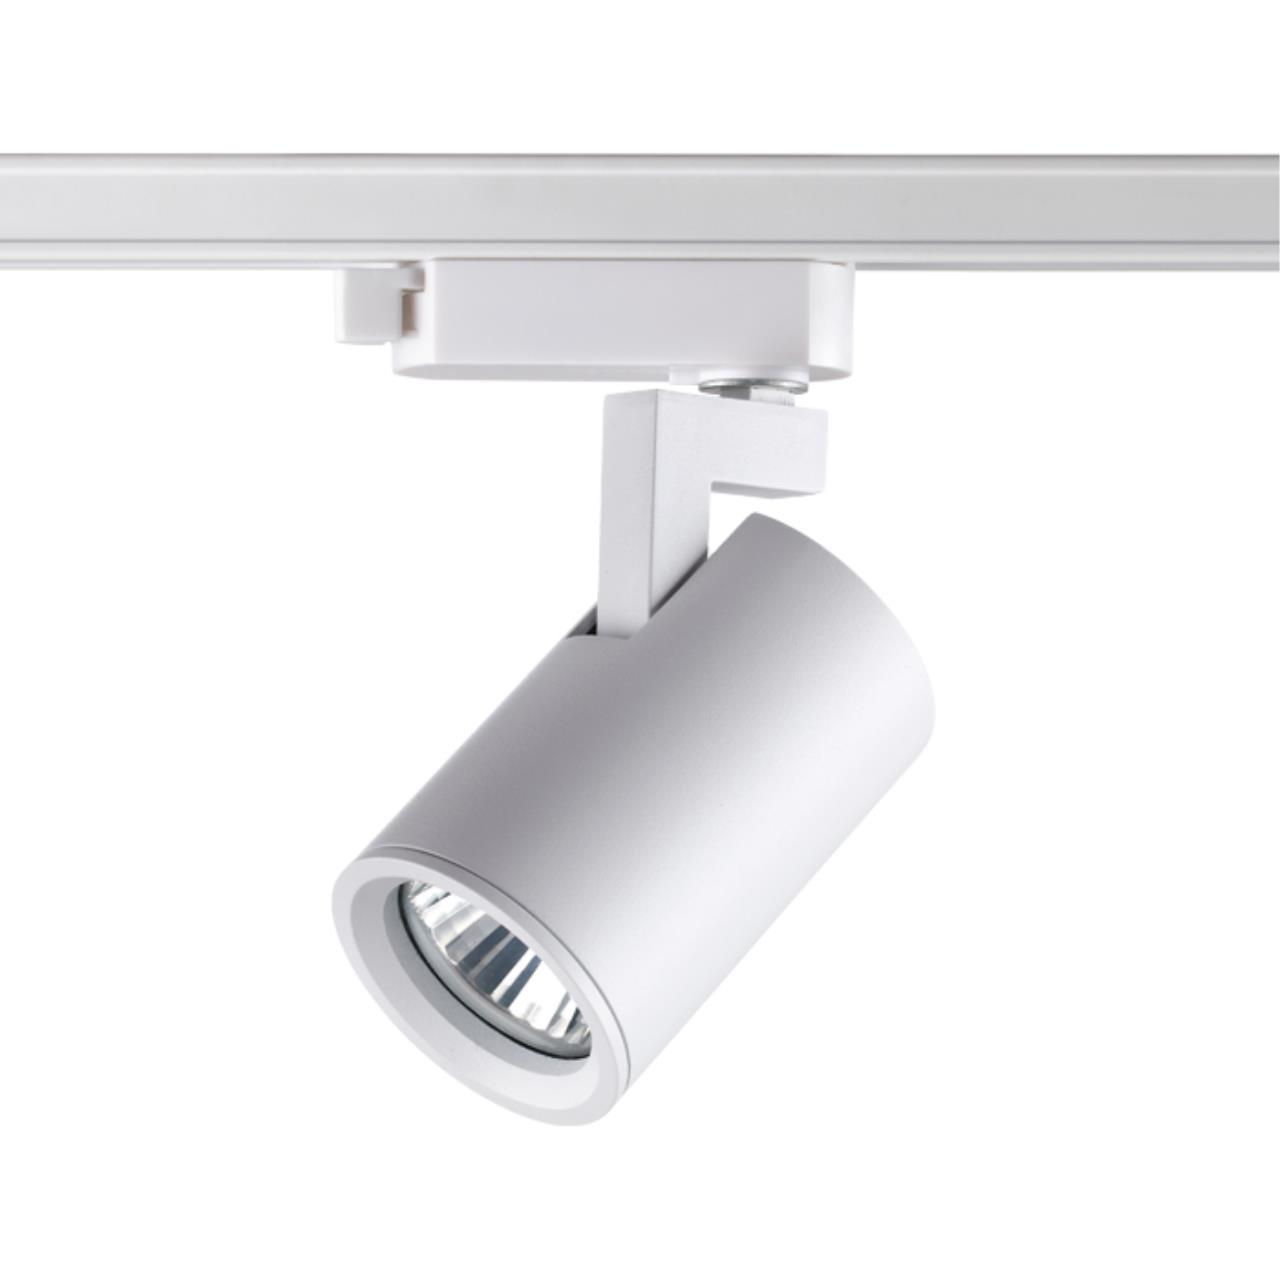 370646 PORT NT19 000 белый Светильник однофазный трековый IP20 GU10 50W 220V GUSTO